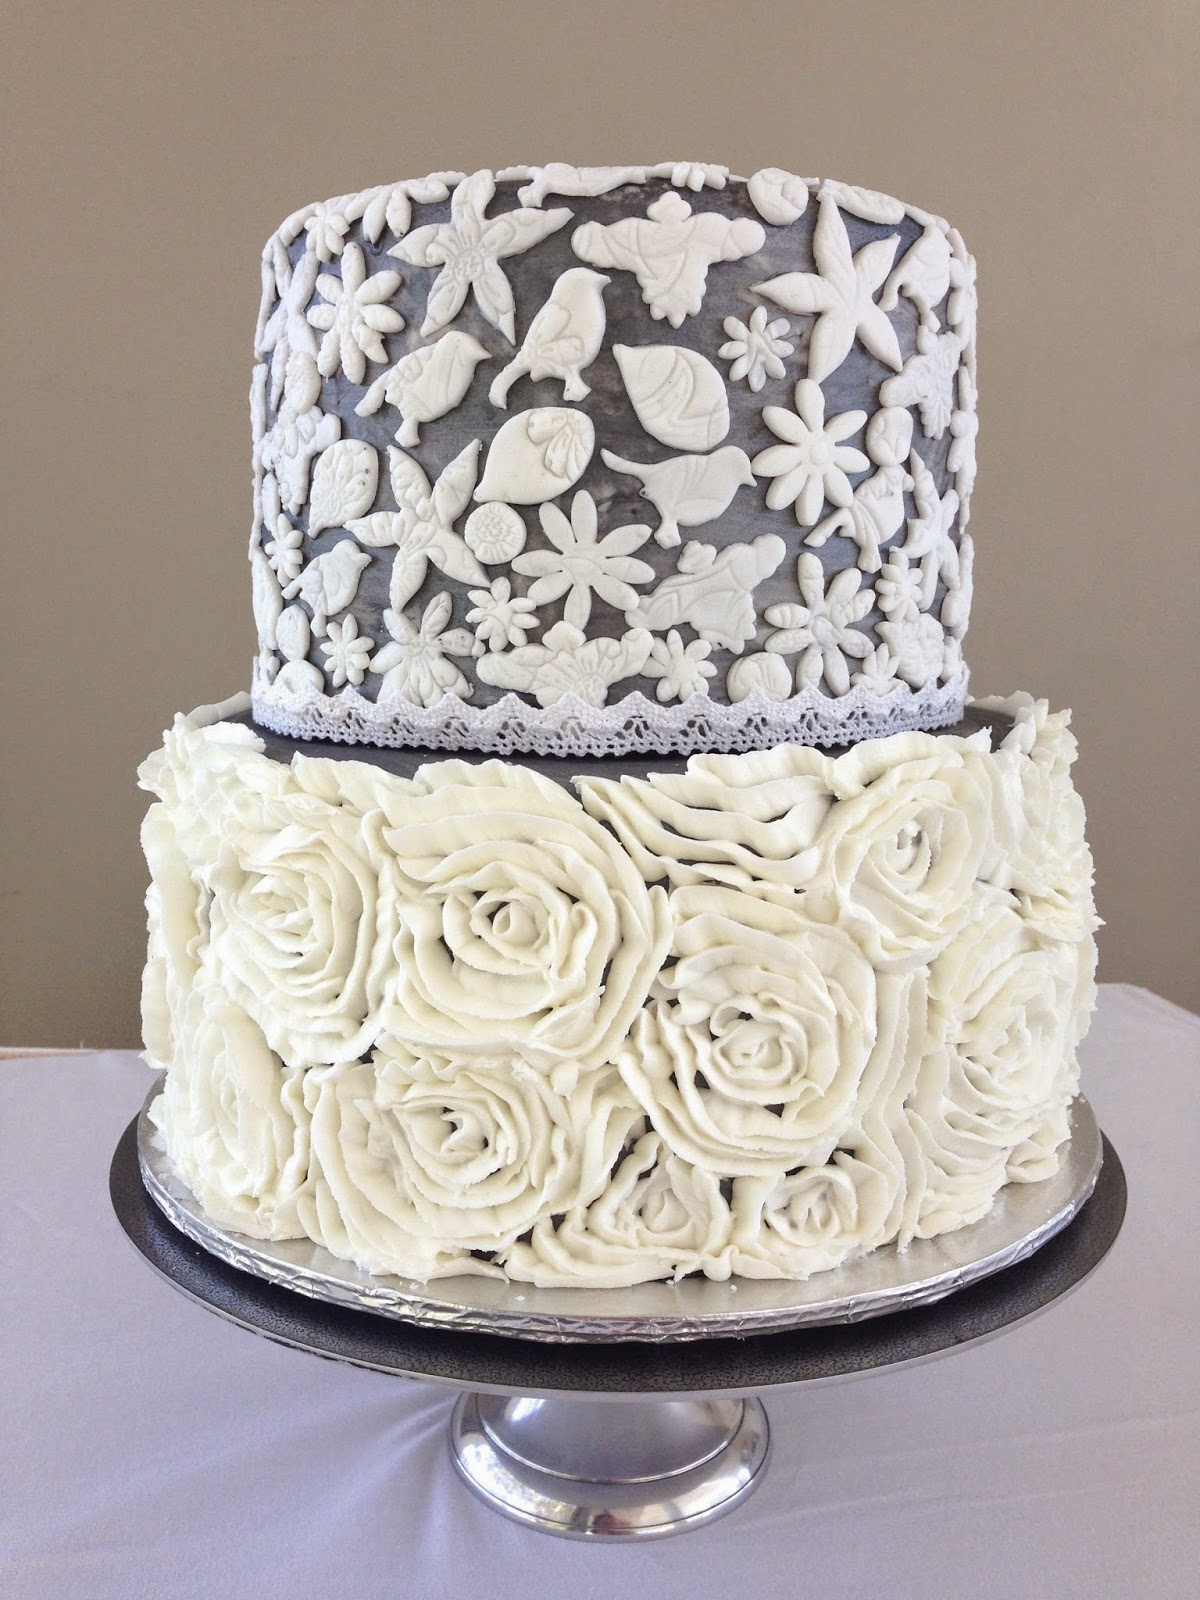 Silver And White Wedding Cake Constancia Cape Town